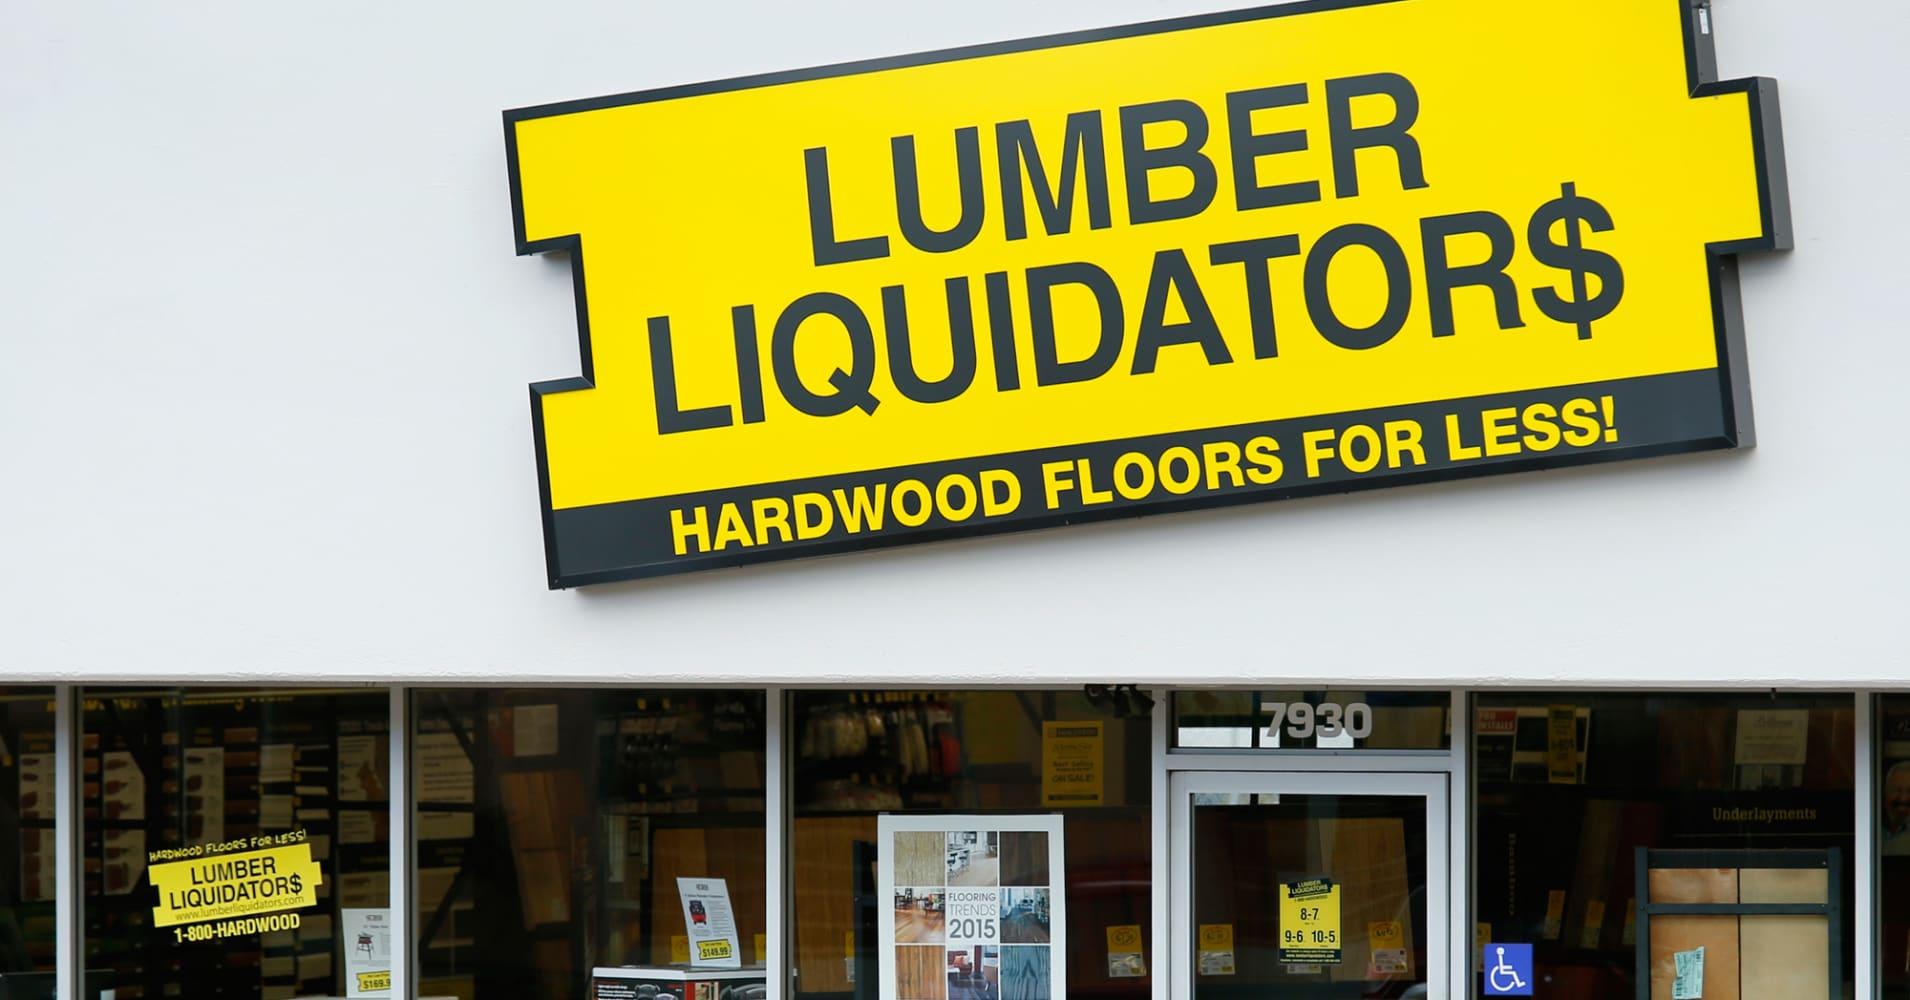 Cheerful Lumber Liquidators Ceo Unexpectedly Resigns Self Serve Lumber Caro Mi Self Serve Lumber Croswell Mi houzz-03 Self Serve Lumber